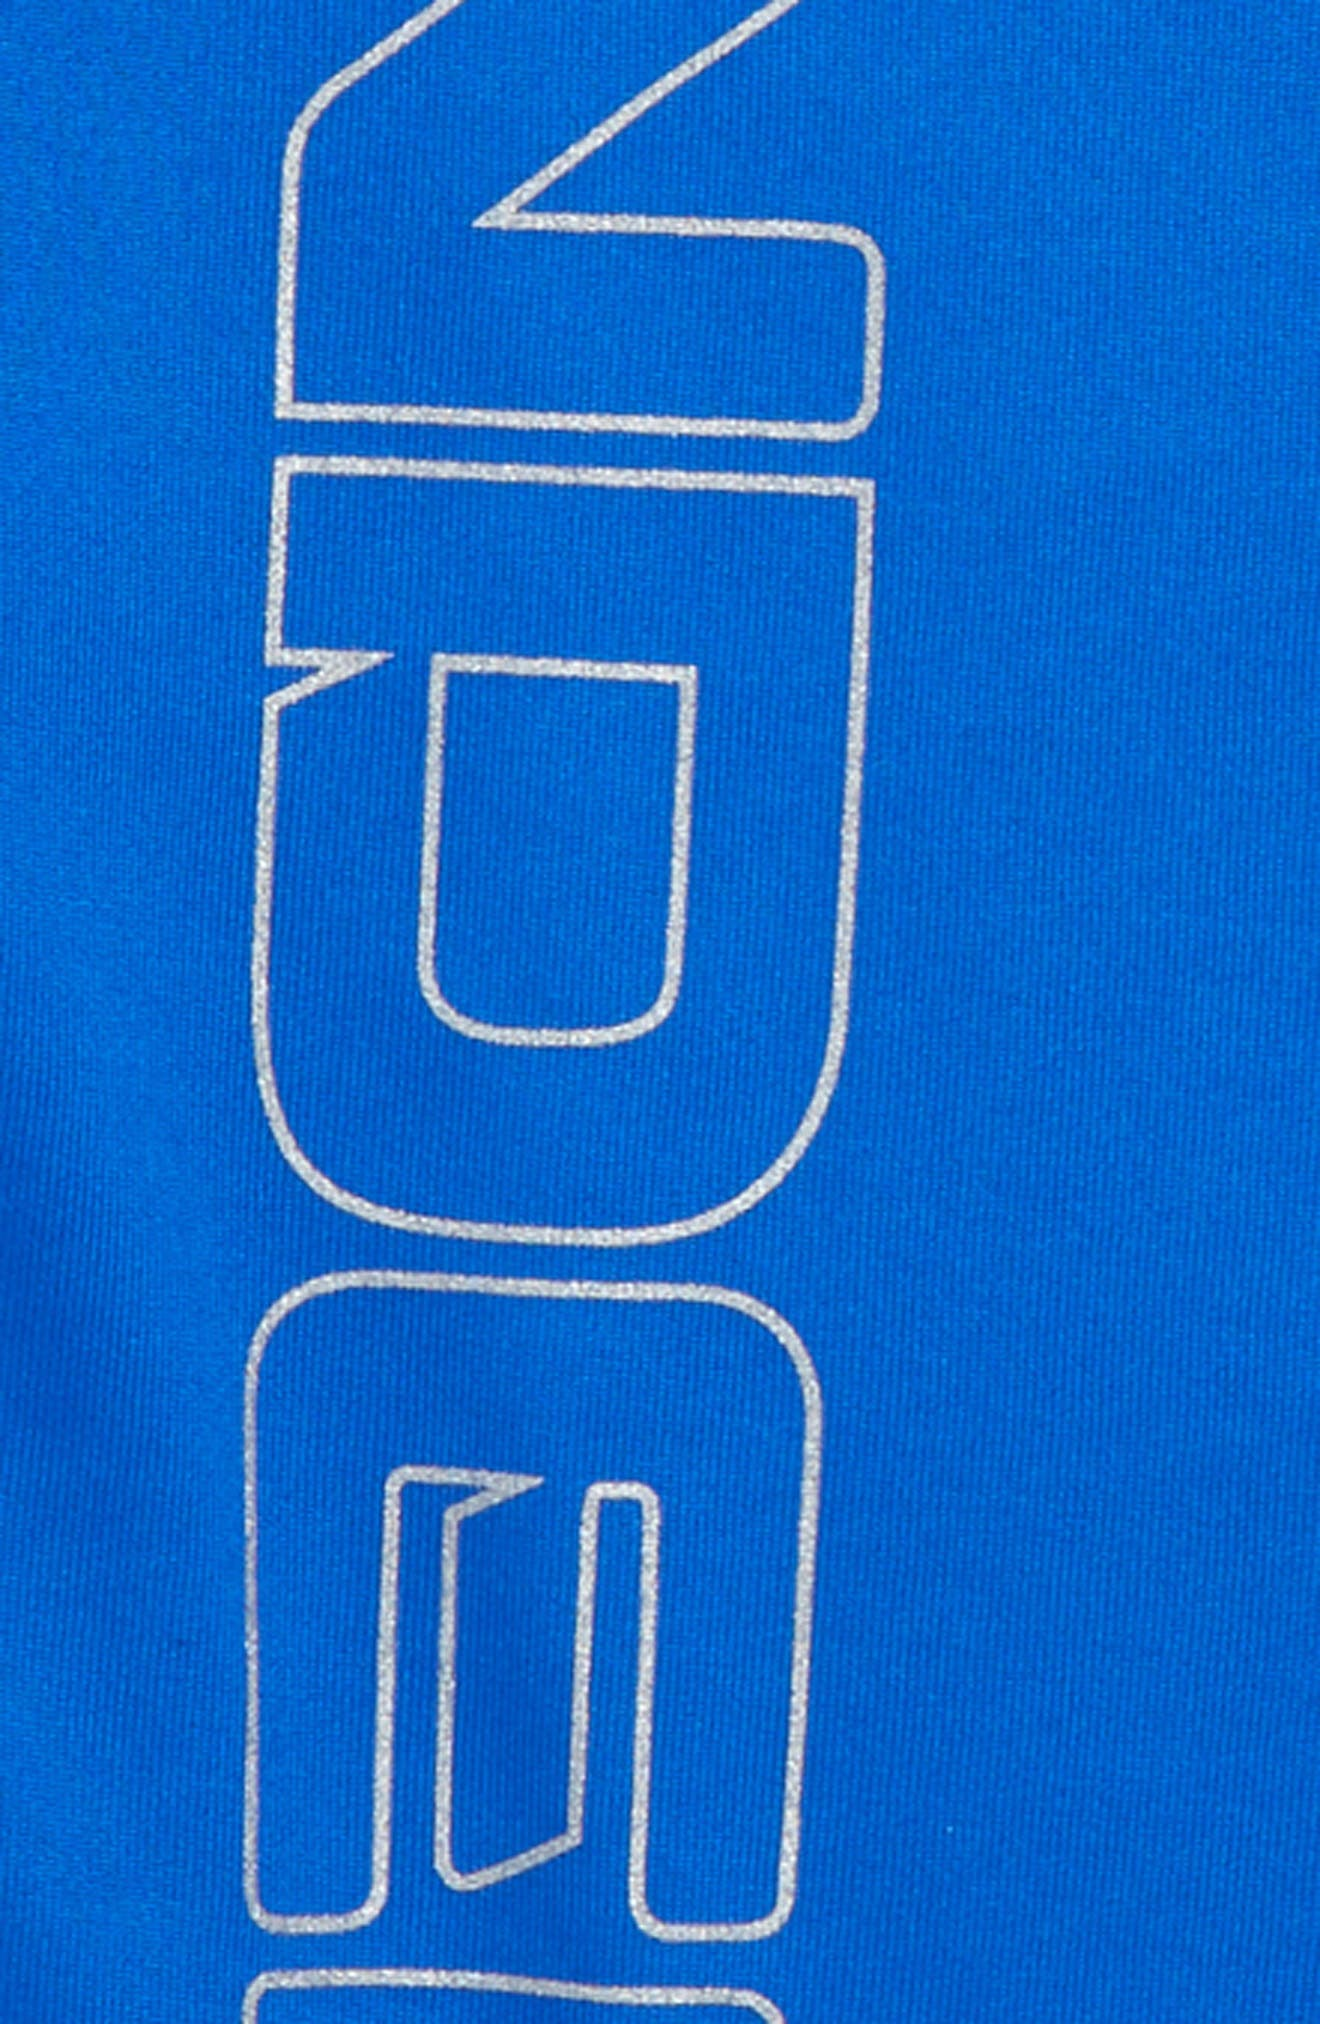 Mesh Tech HeatGear<sup>®</sup> T-Shirt,                             Alternate thumbnail 3, color,                             Ultra Blue